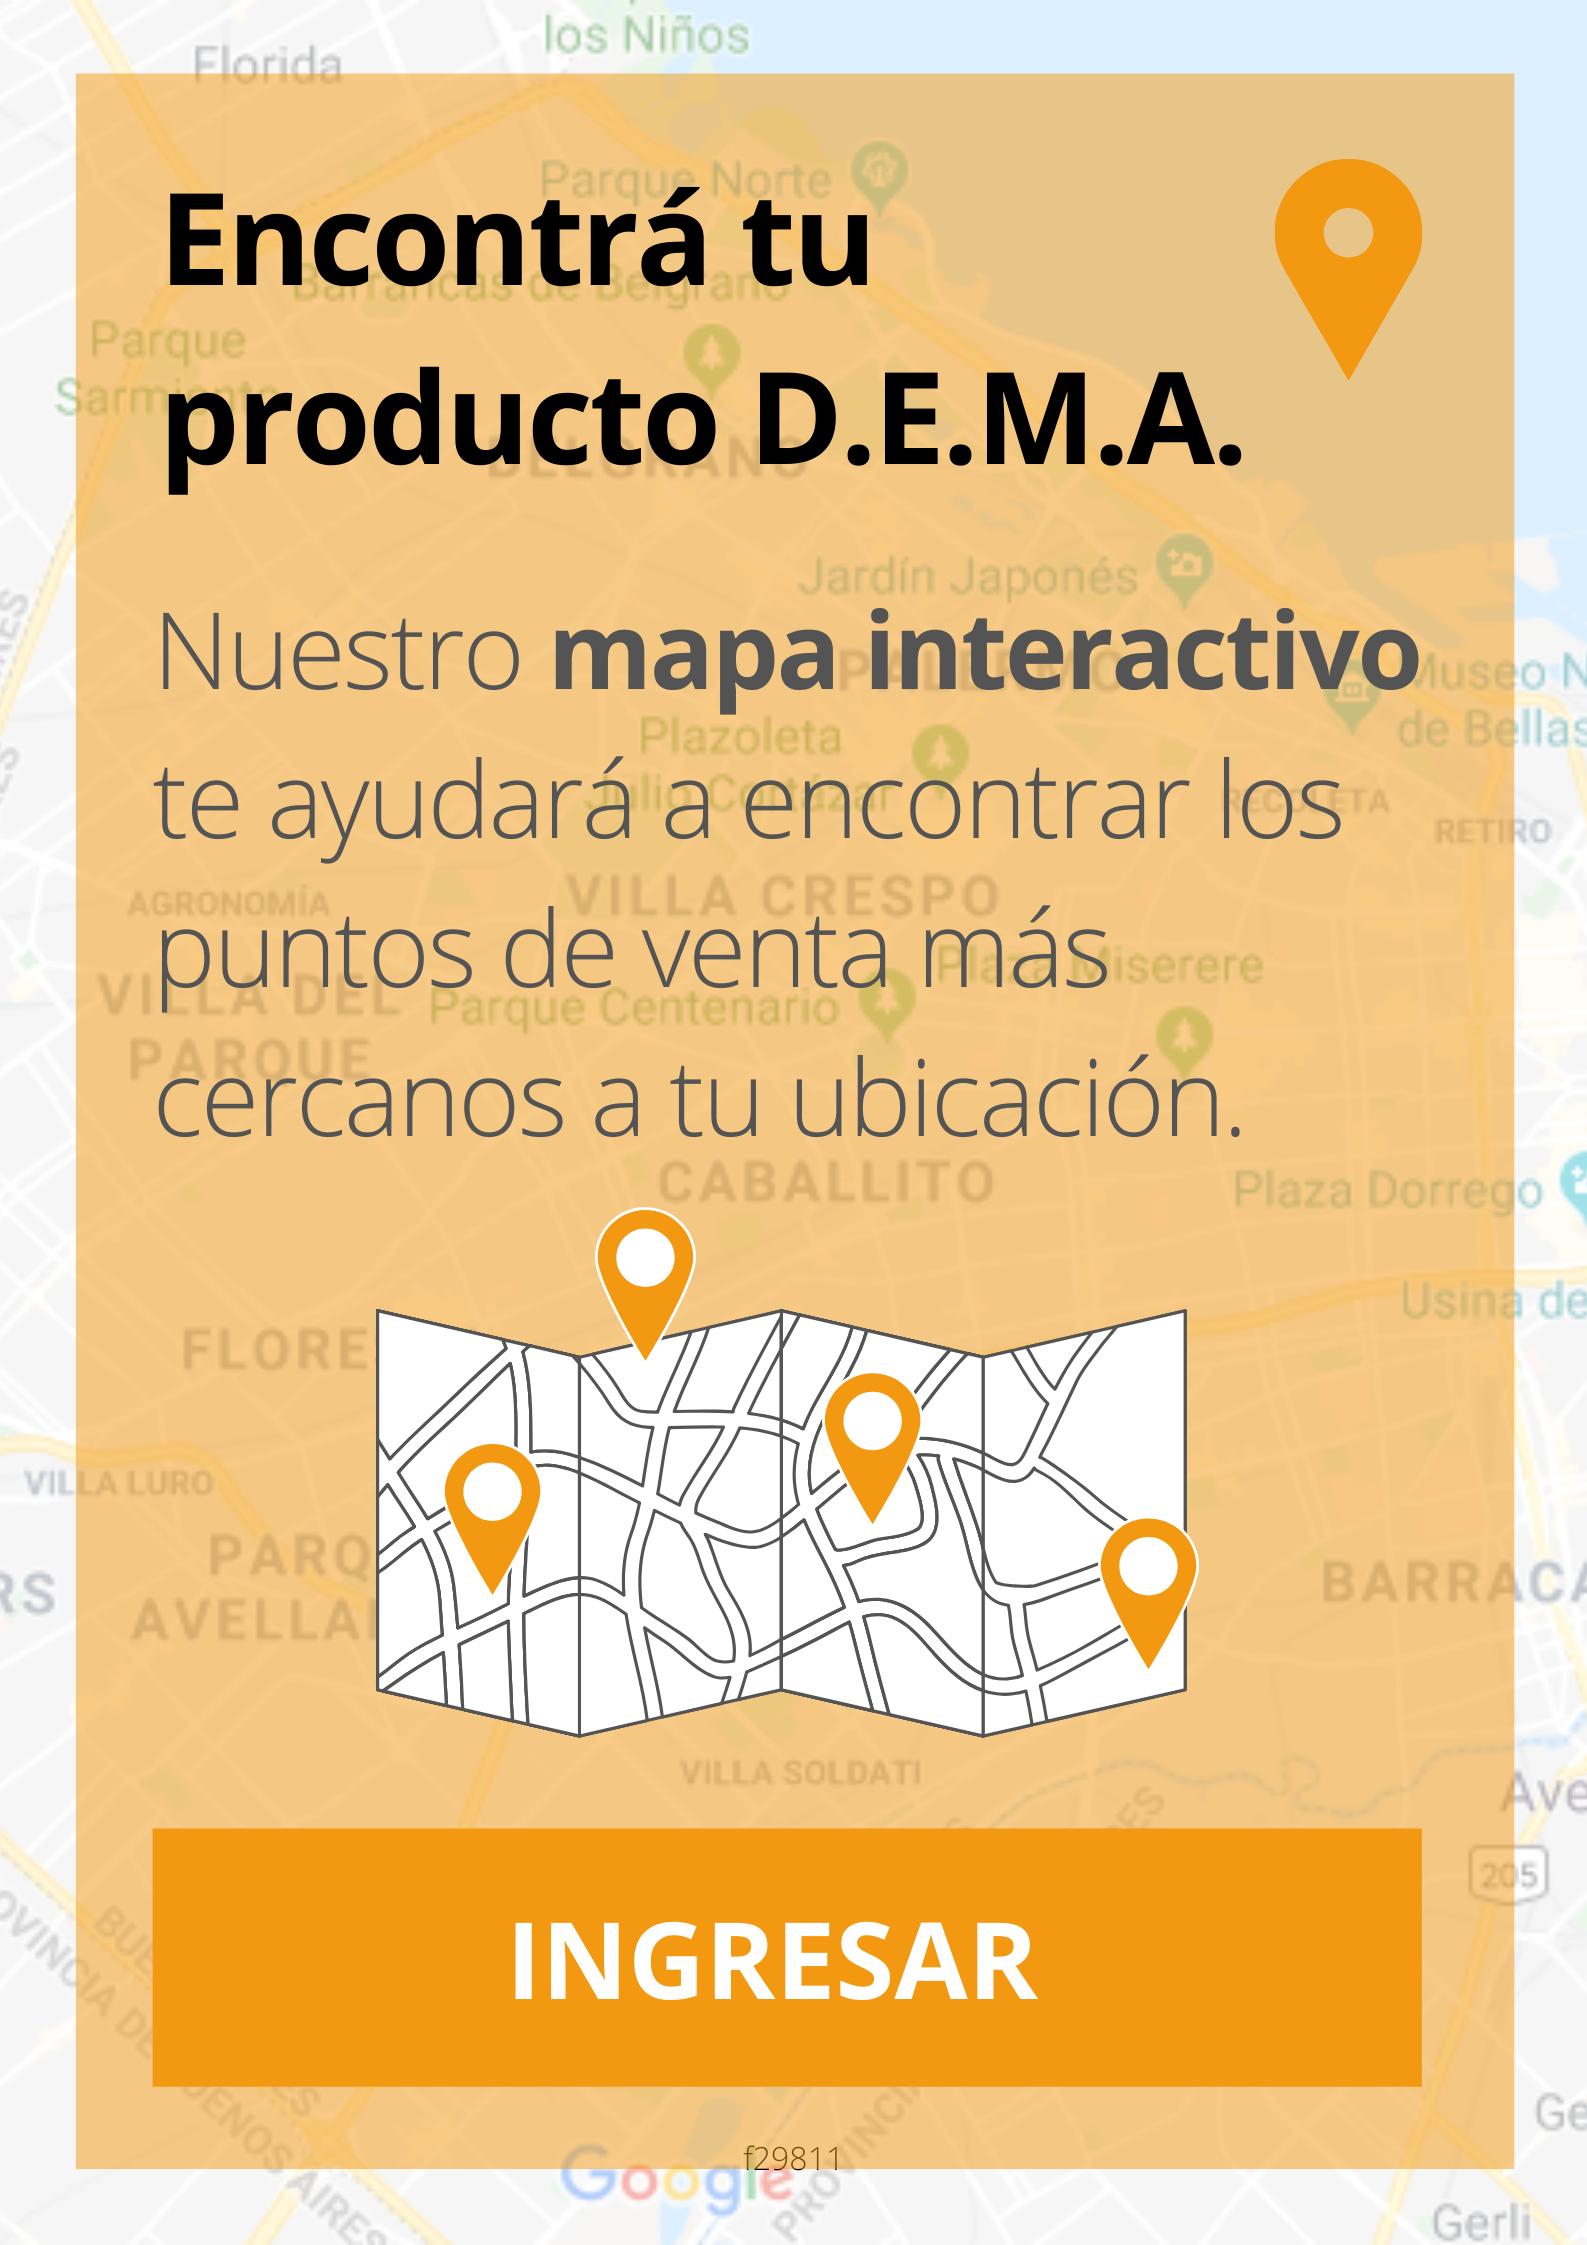 Mapa productos D.E.M.A.